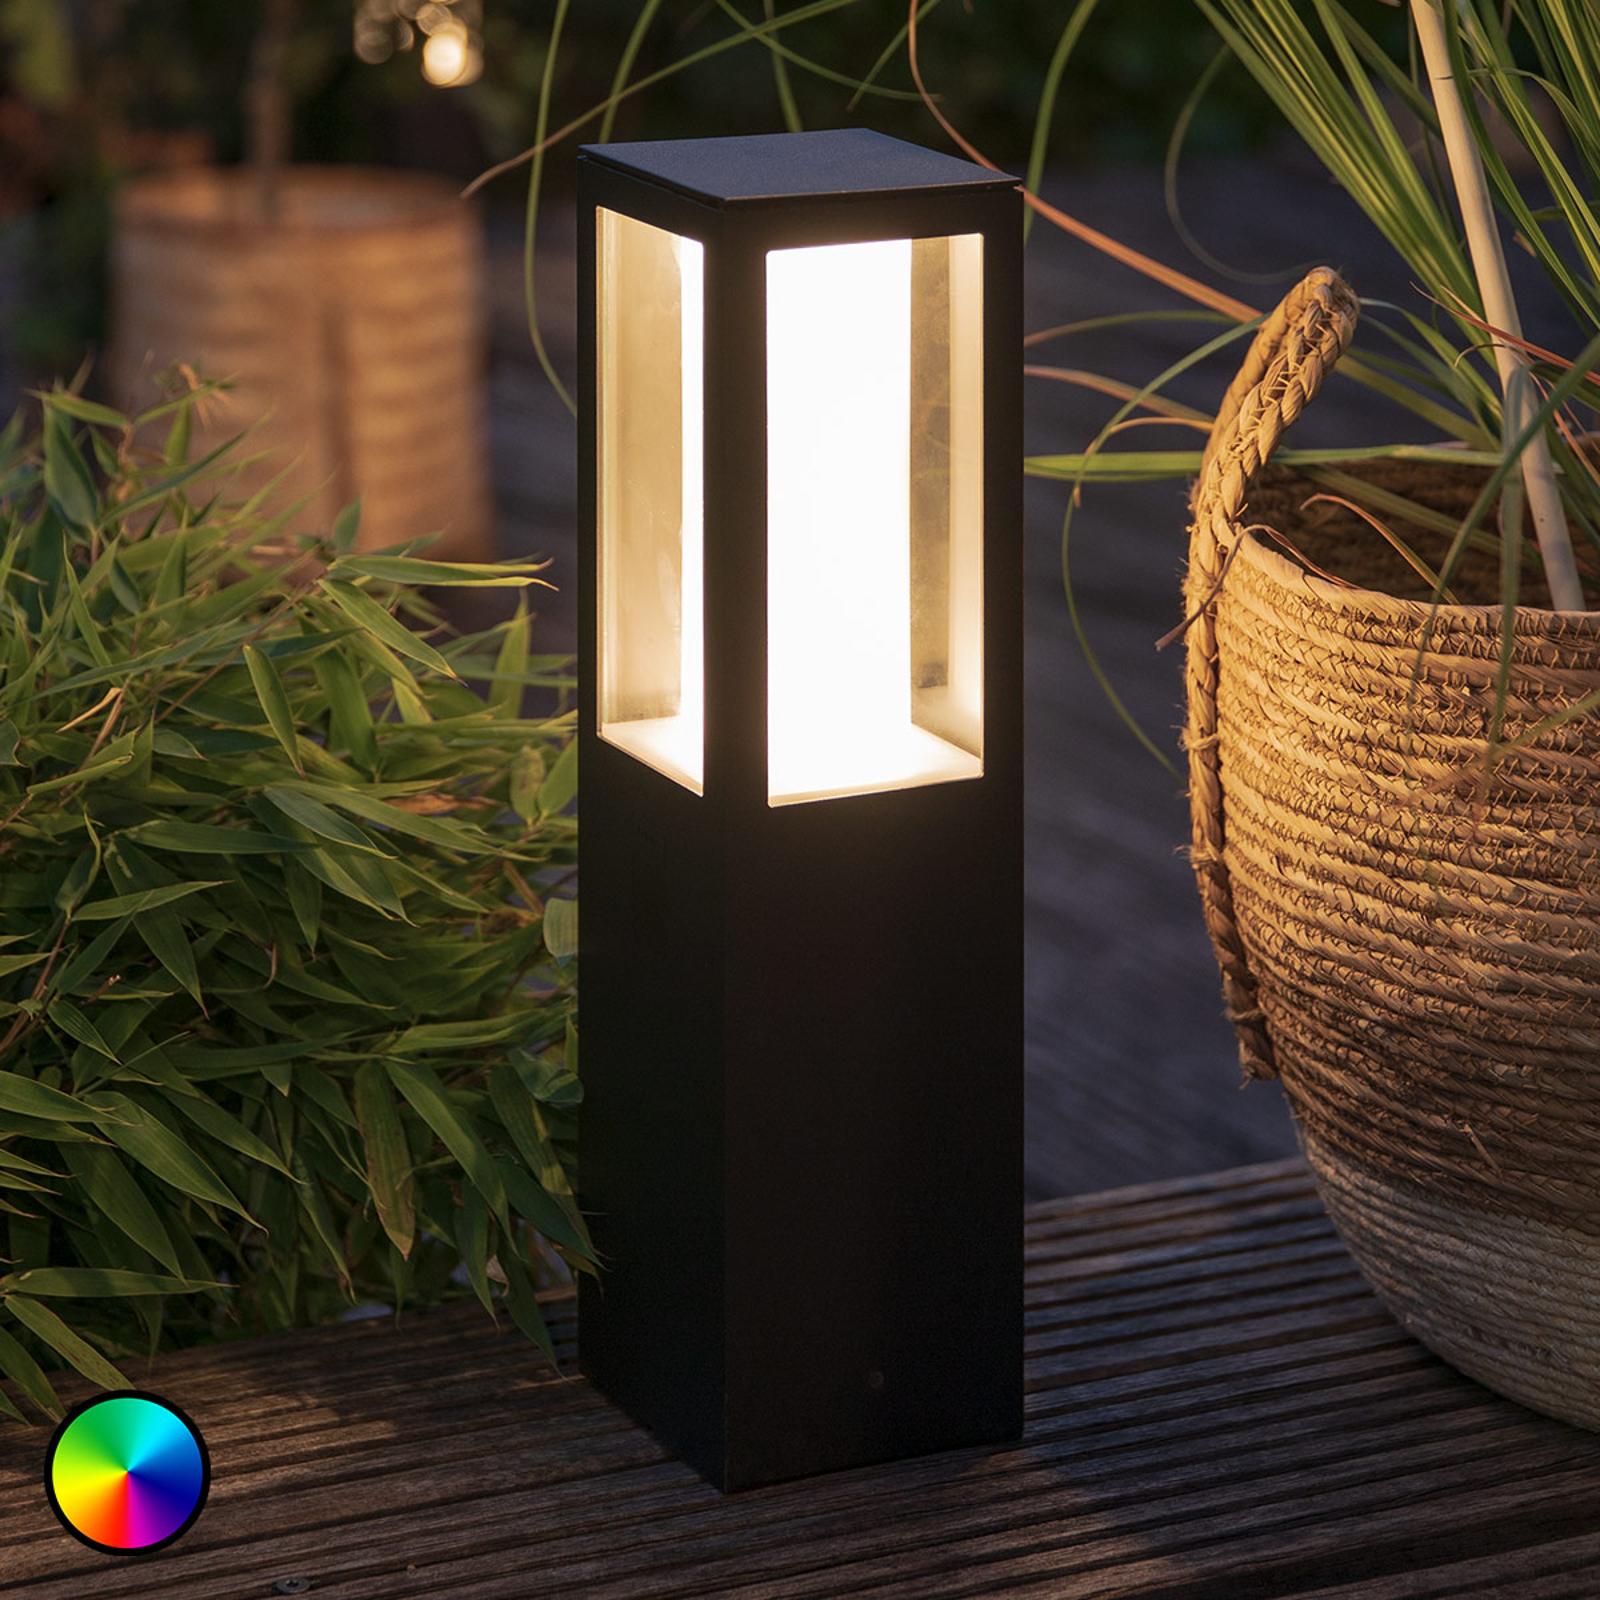 Philips Hue White+Color Impress potelet LED